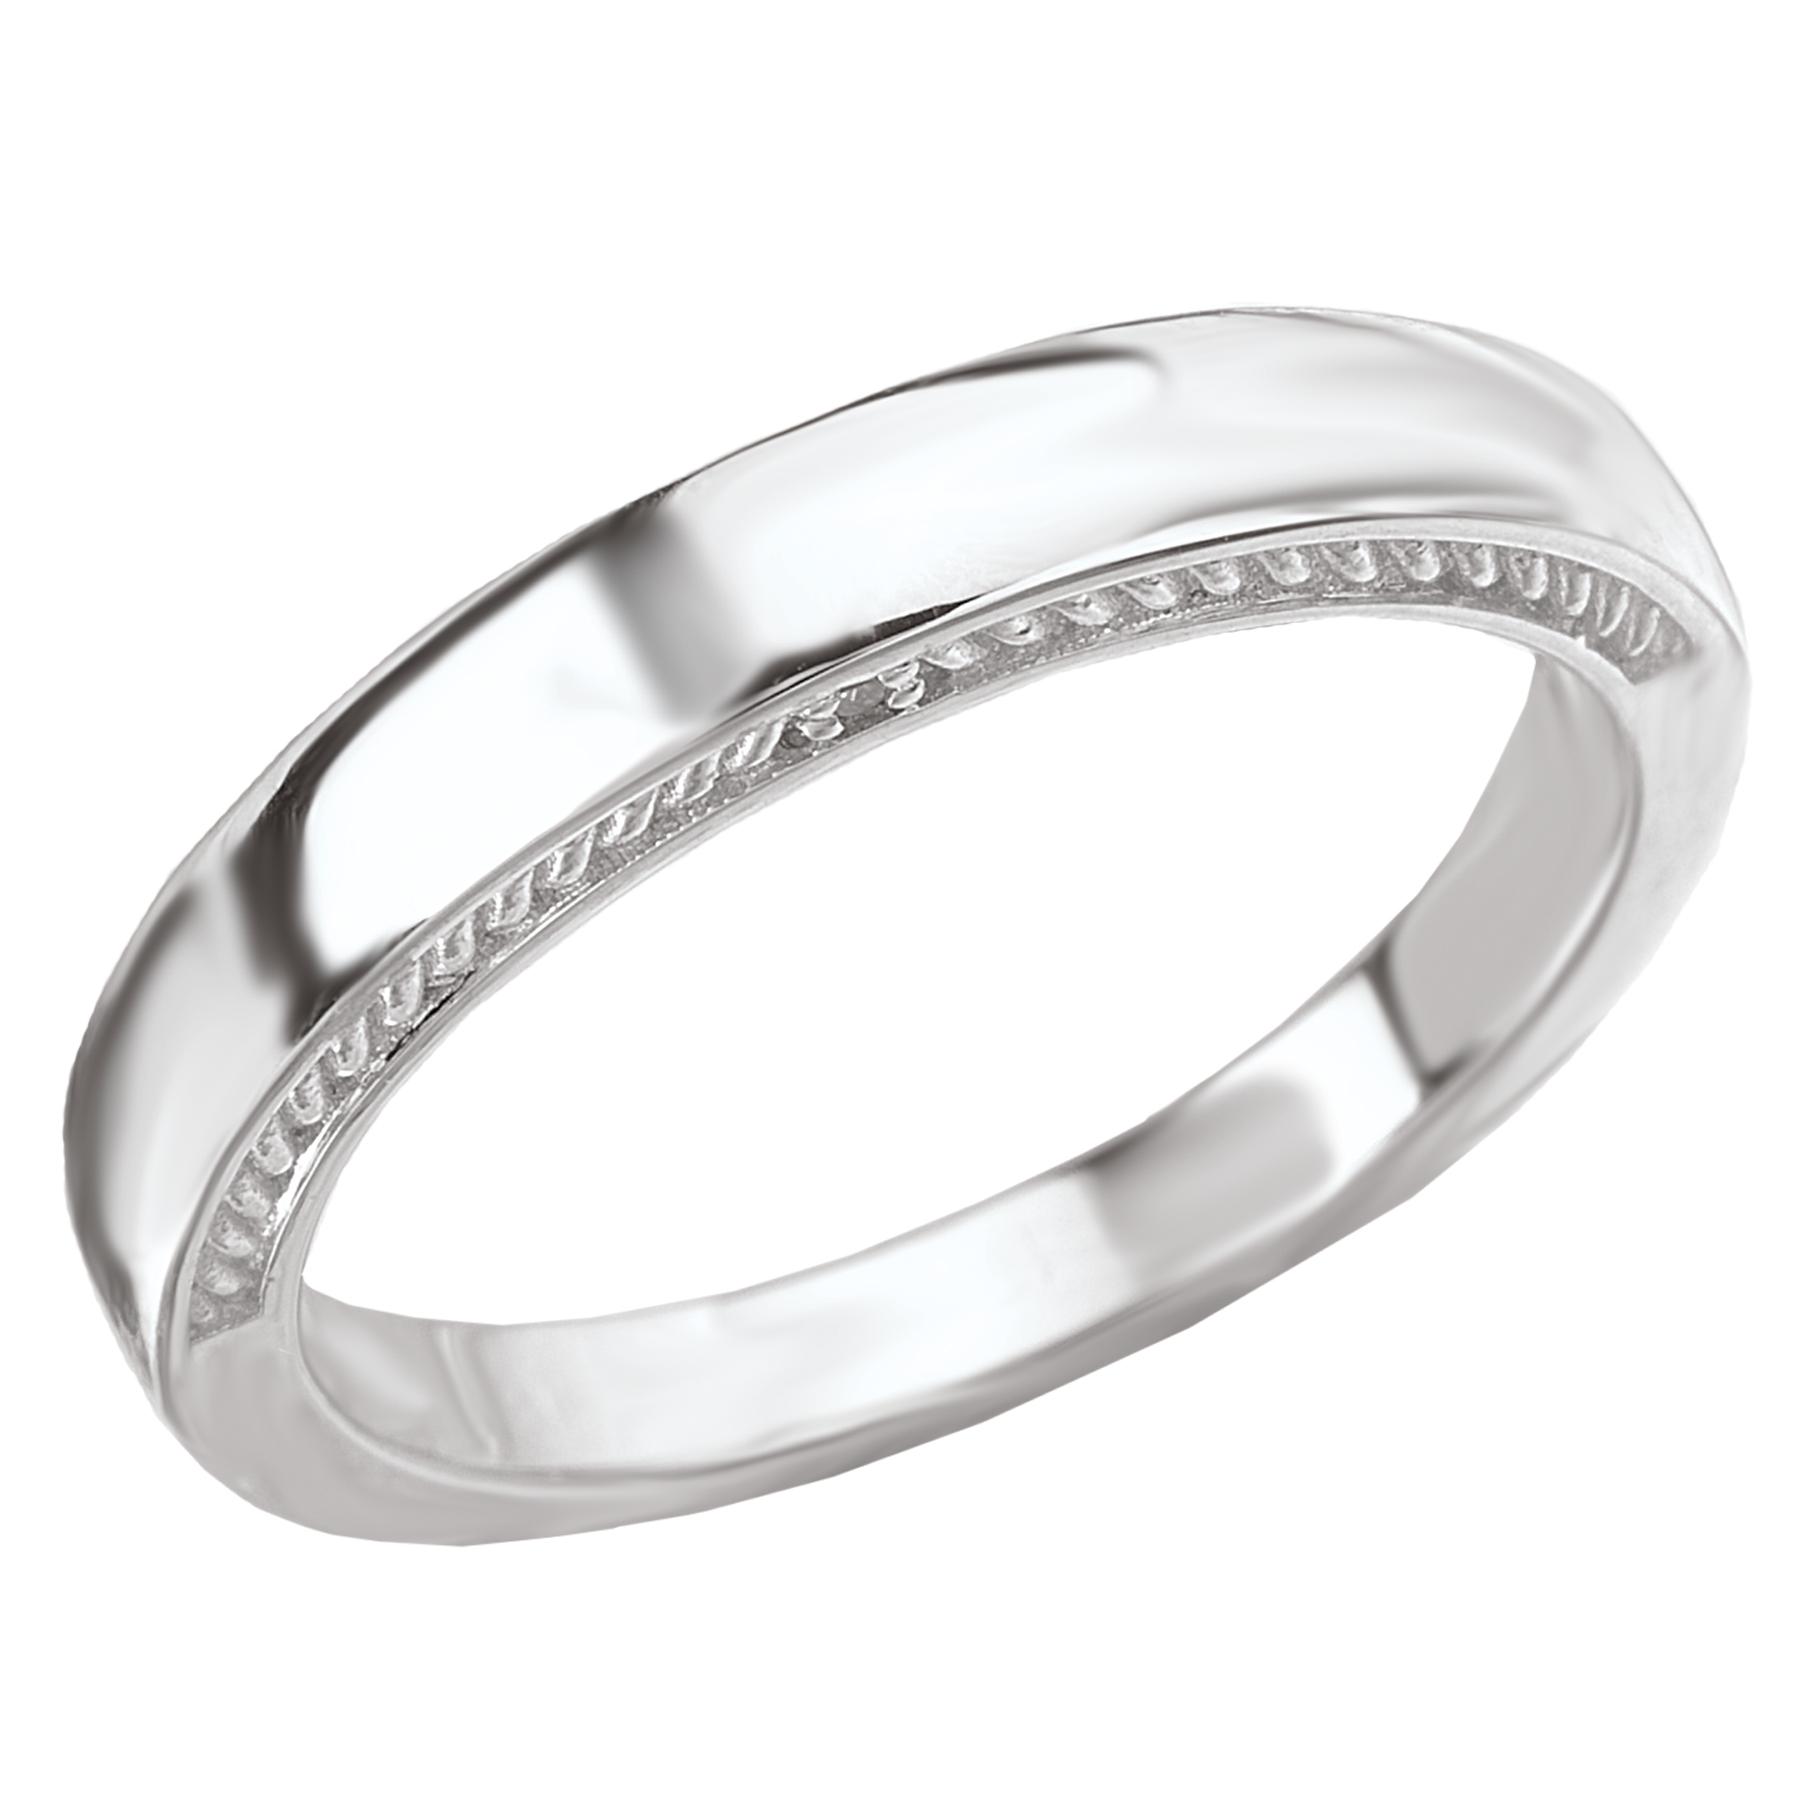 Romance Wedding Bands 117405-100W product image